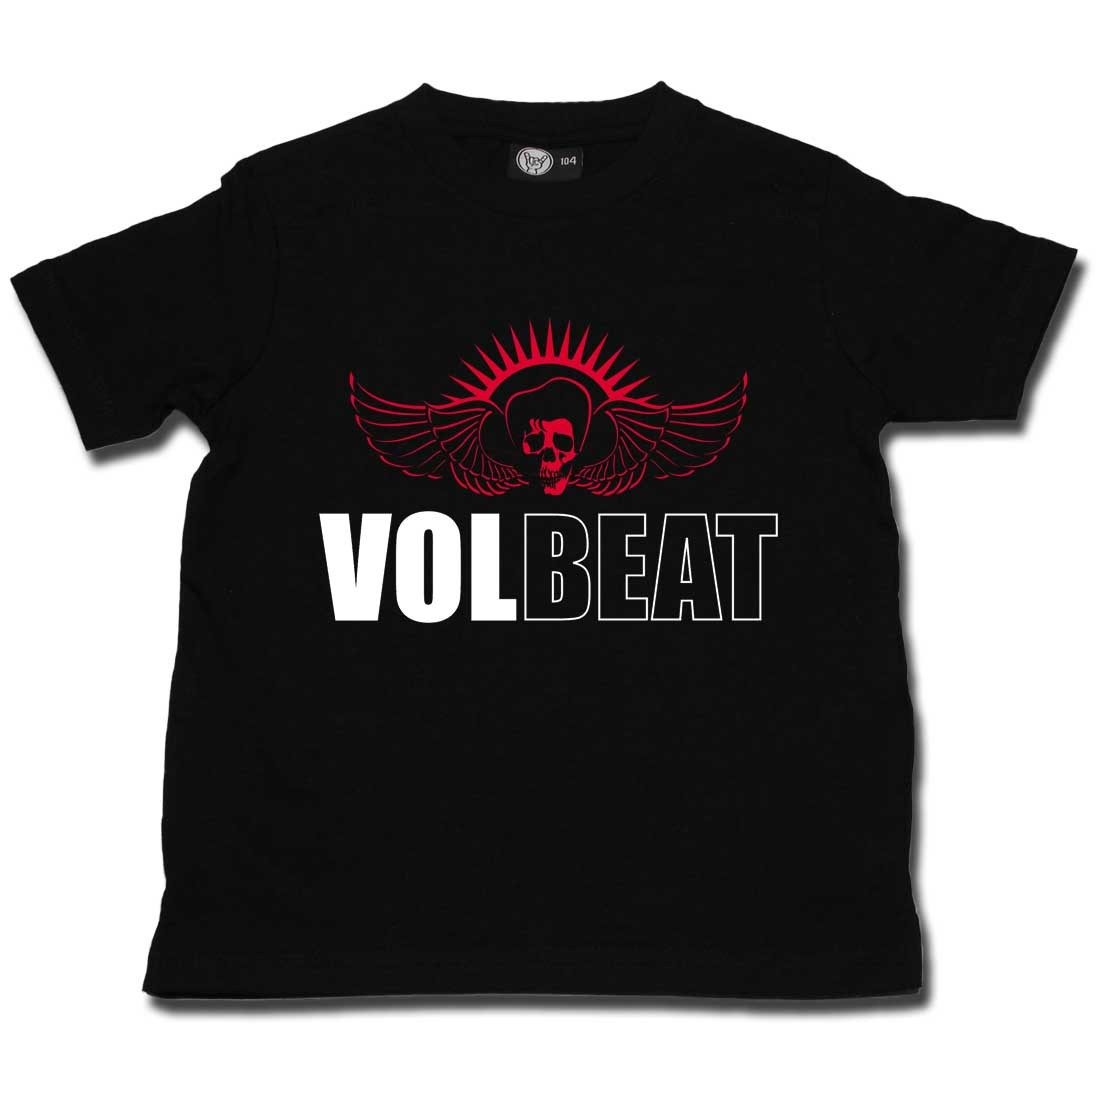 Volbeat Kids T-Volbeat Kids T-shirt Skullwing (Clothing)Skullwing (Clothing)